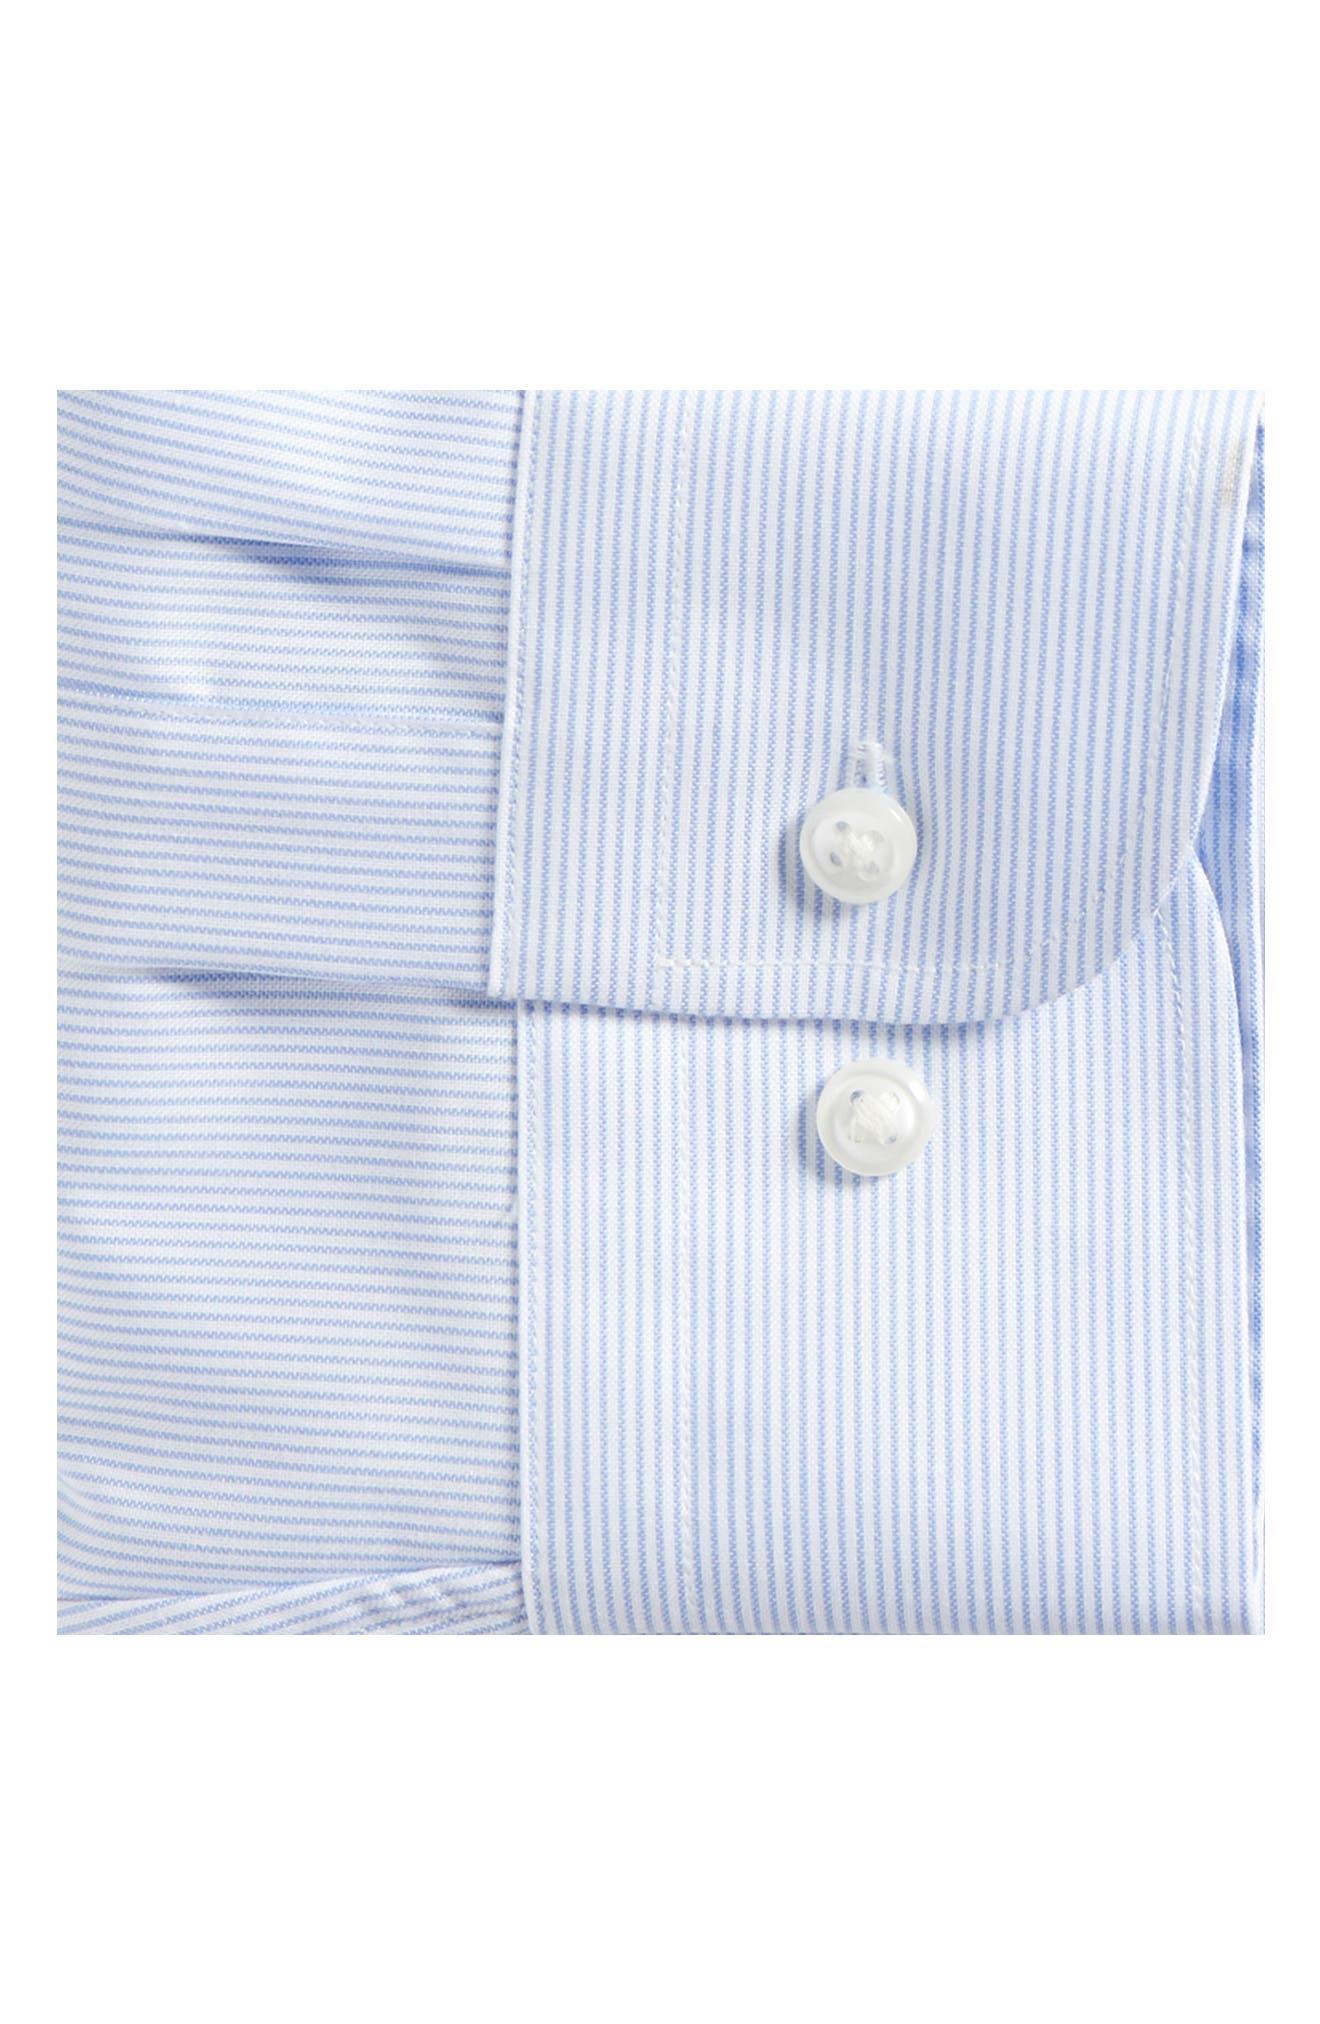 Trim Fit Non-Iron Stripe Dress Shirt,                             Alternate thumbnail 5, color,                             Blue Vista